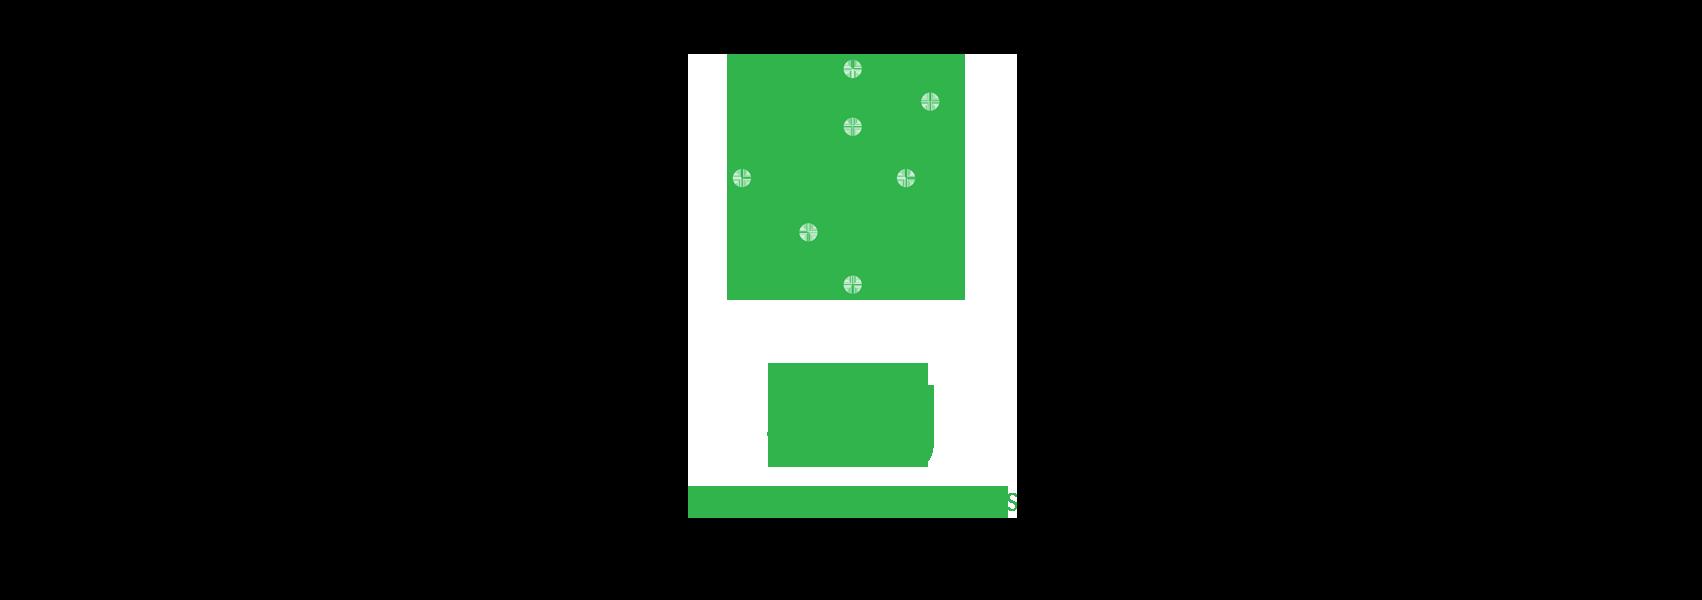 sireg - regression testing for websites